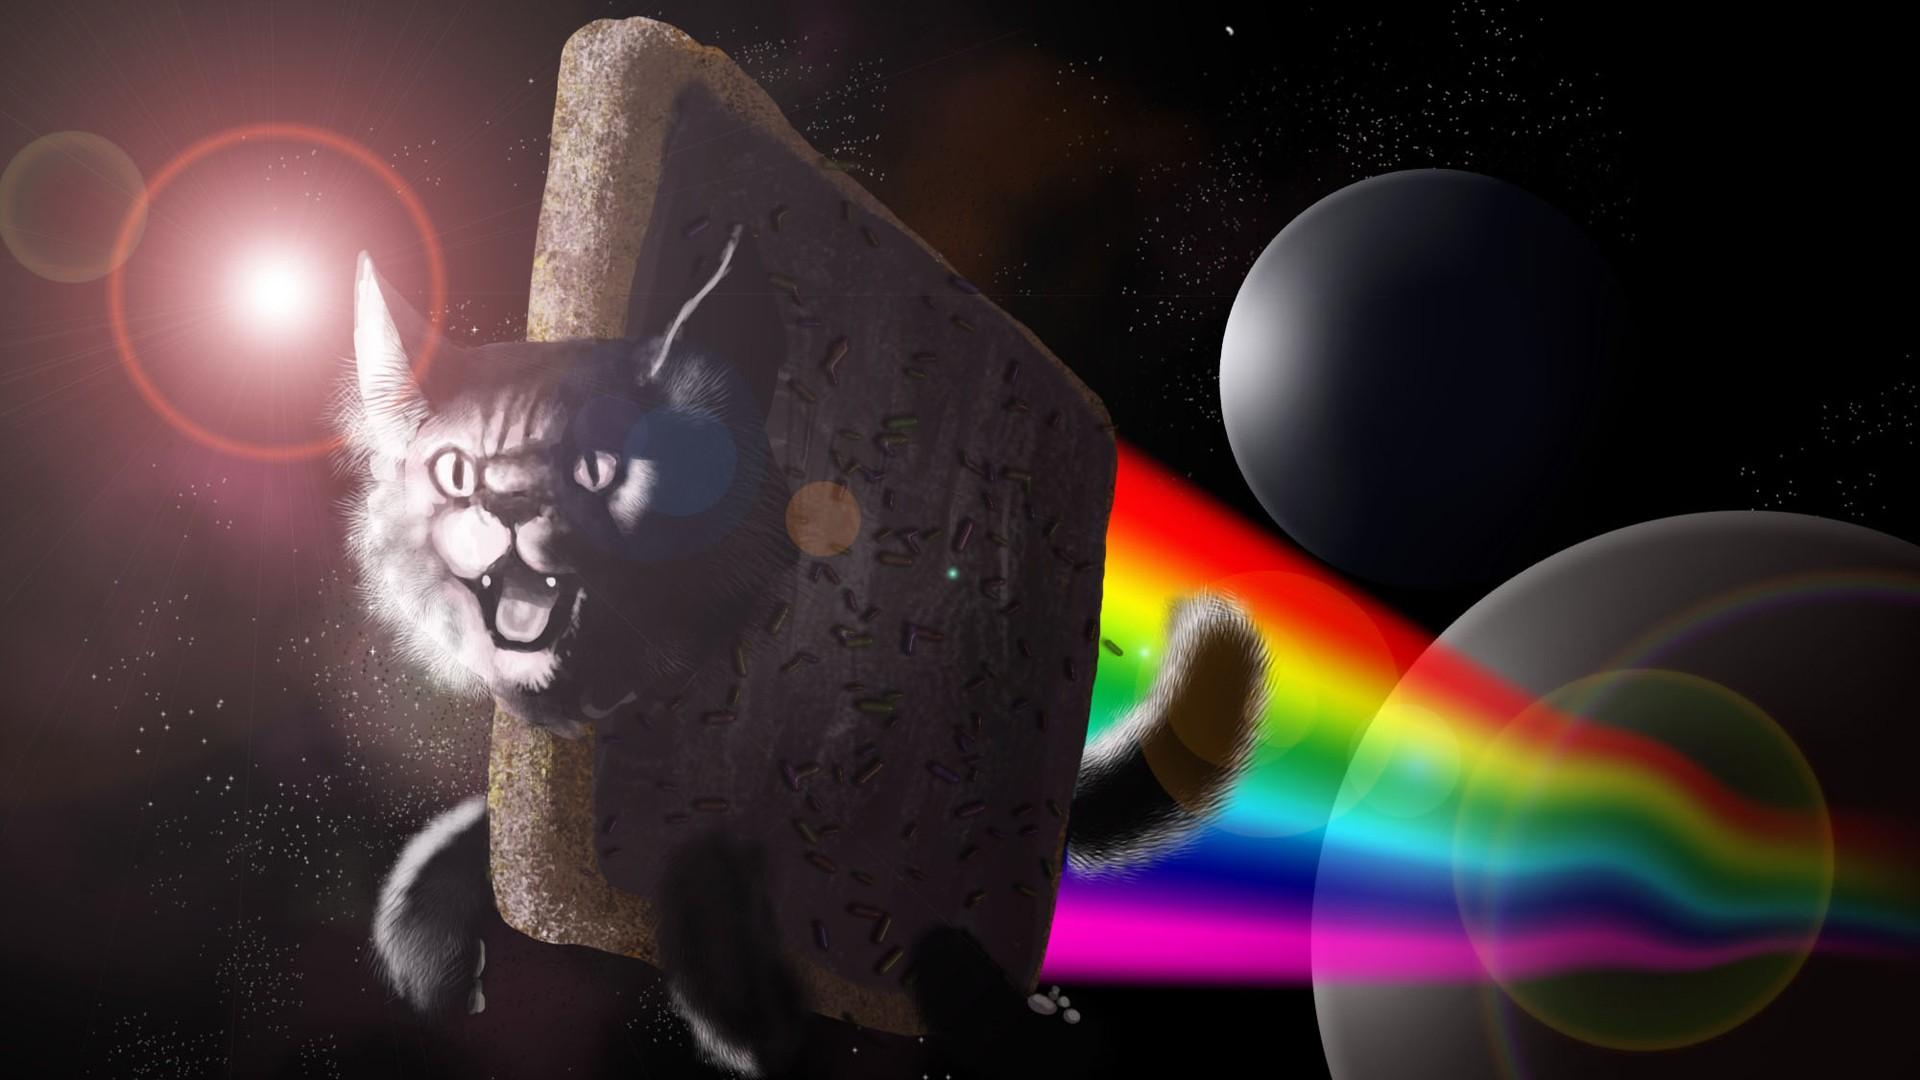 General 1920x1080 Nyan Cat digital art space art cats animals colorful humor LSD rainbows